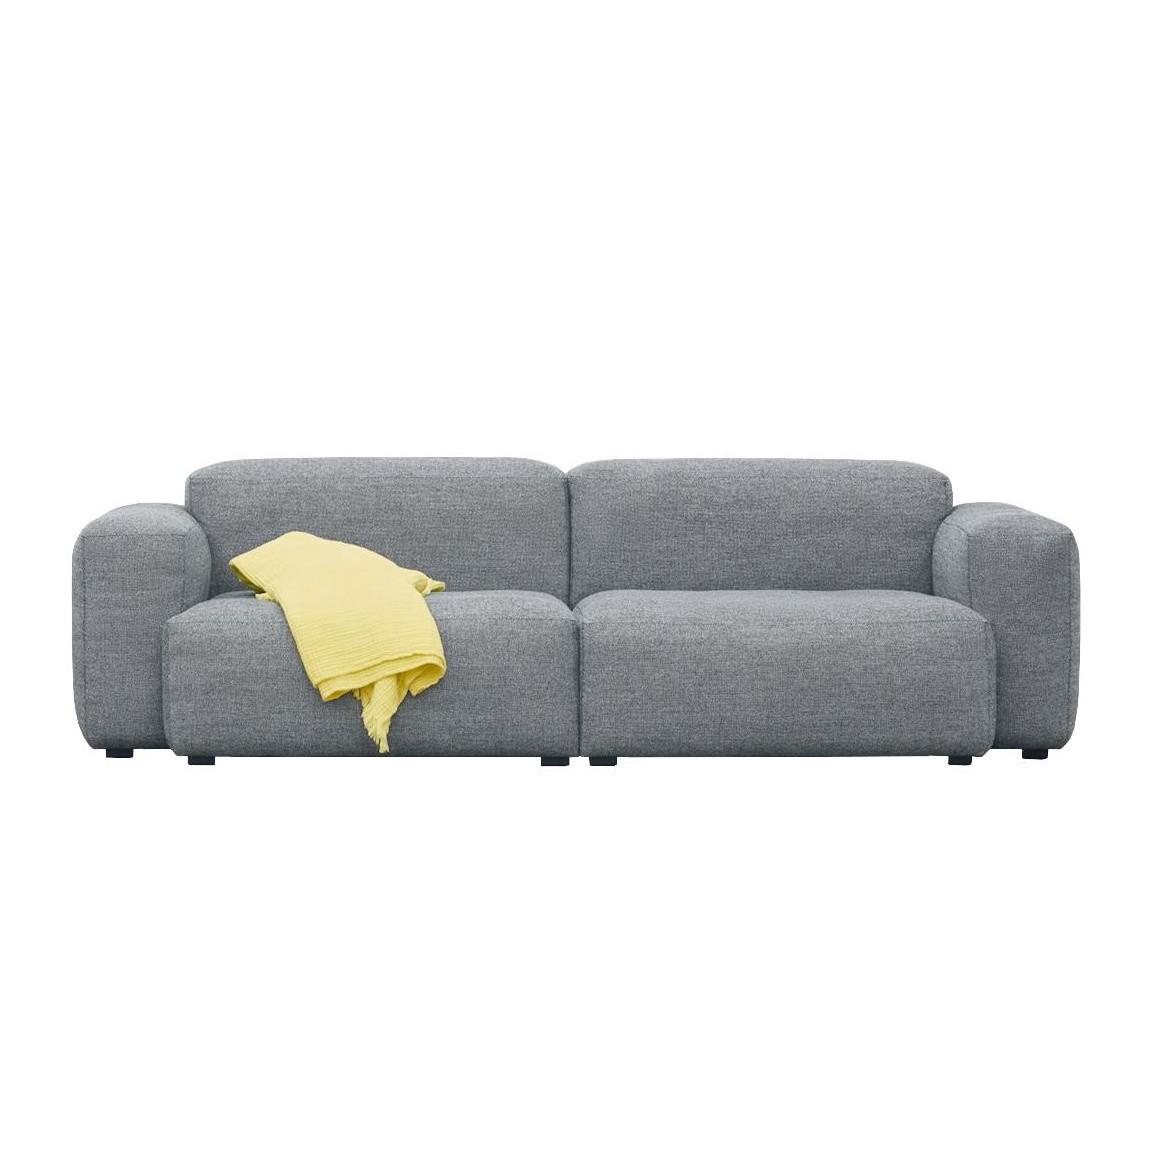 Full Size of Sofa 2 5 Sitzer Hay Mags Soft L Mit Schlaffunktion Bett Weiß 160x200 120x200 Matratze Und Lattenrost 3 1 Höffner Big Alcantara Minotti 180x200 Sitzsack Sofa Sofa 2 5 Sitzer